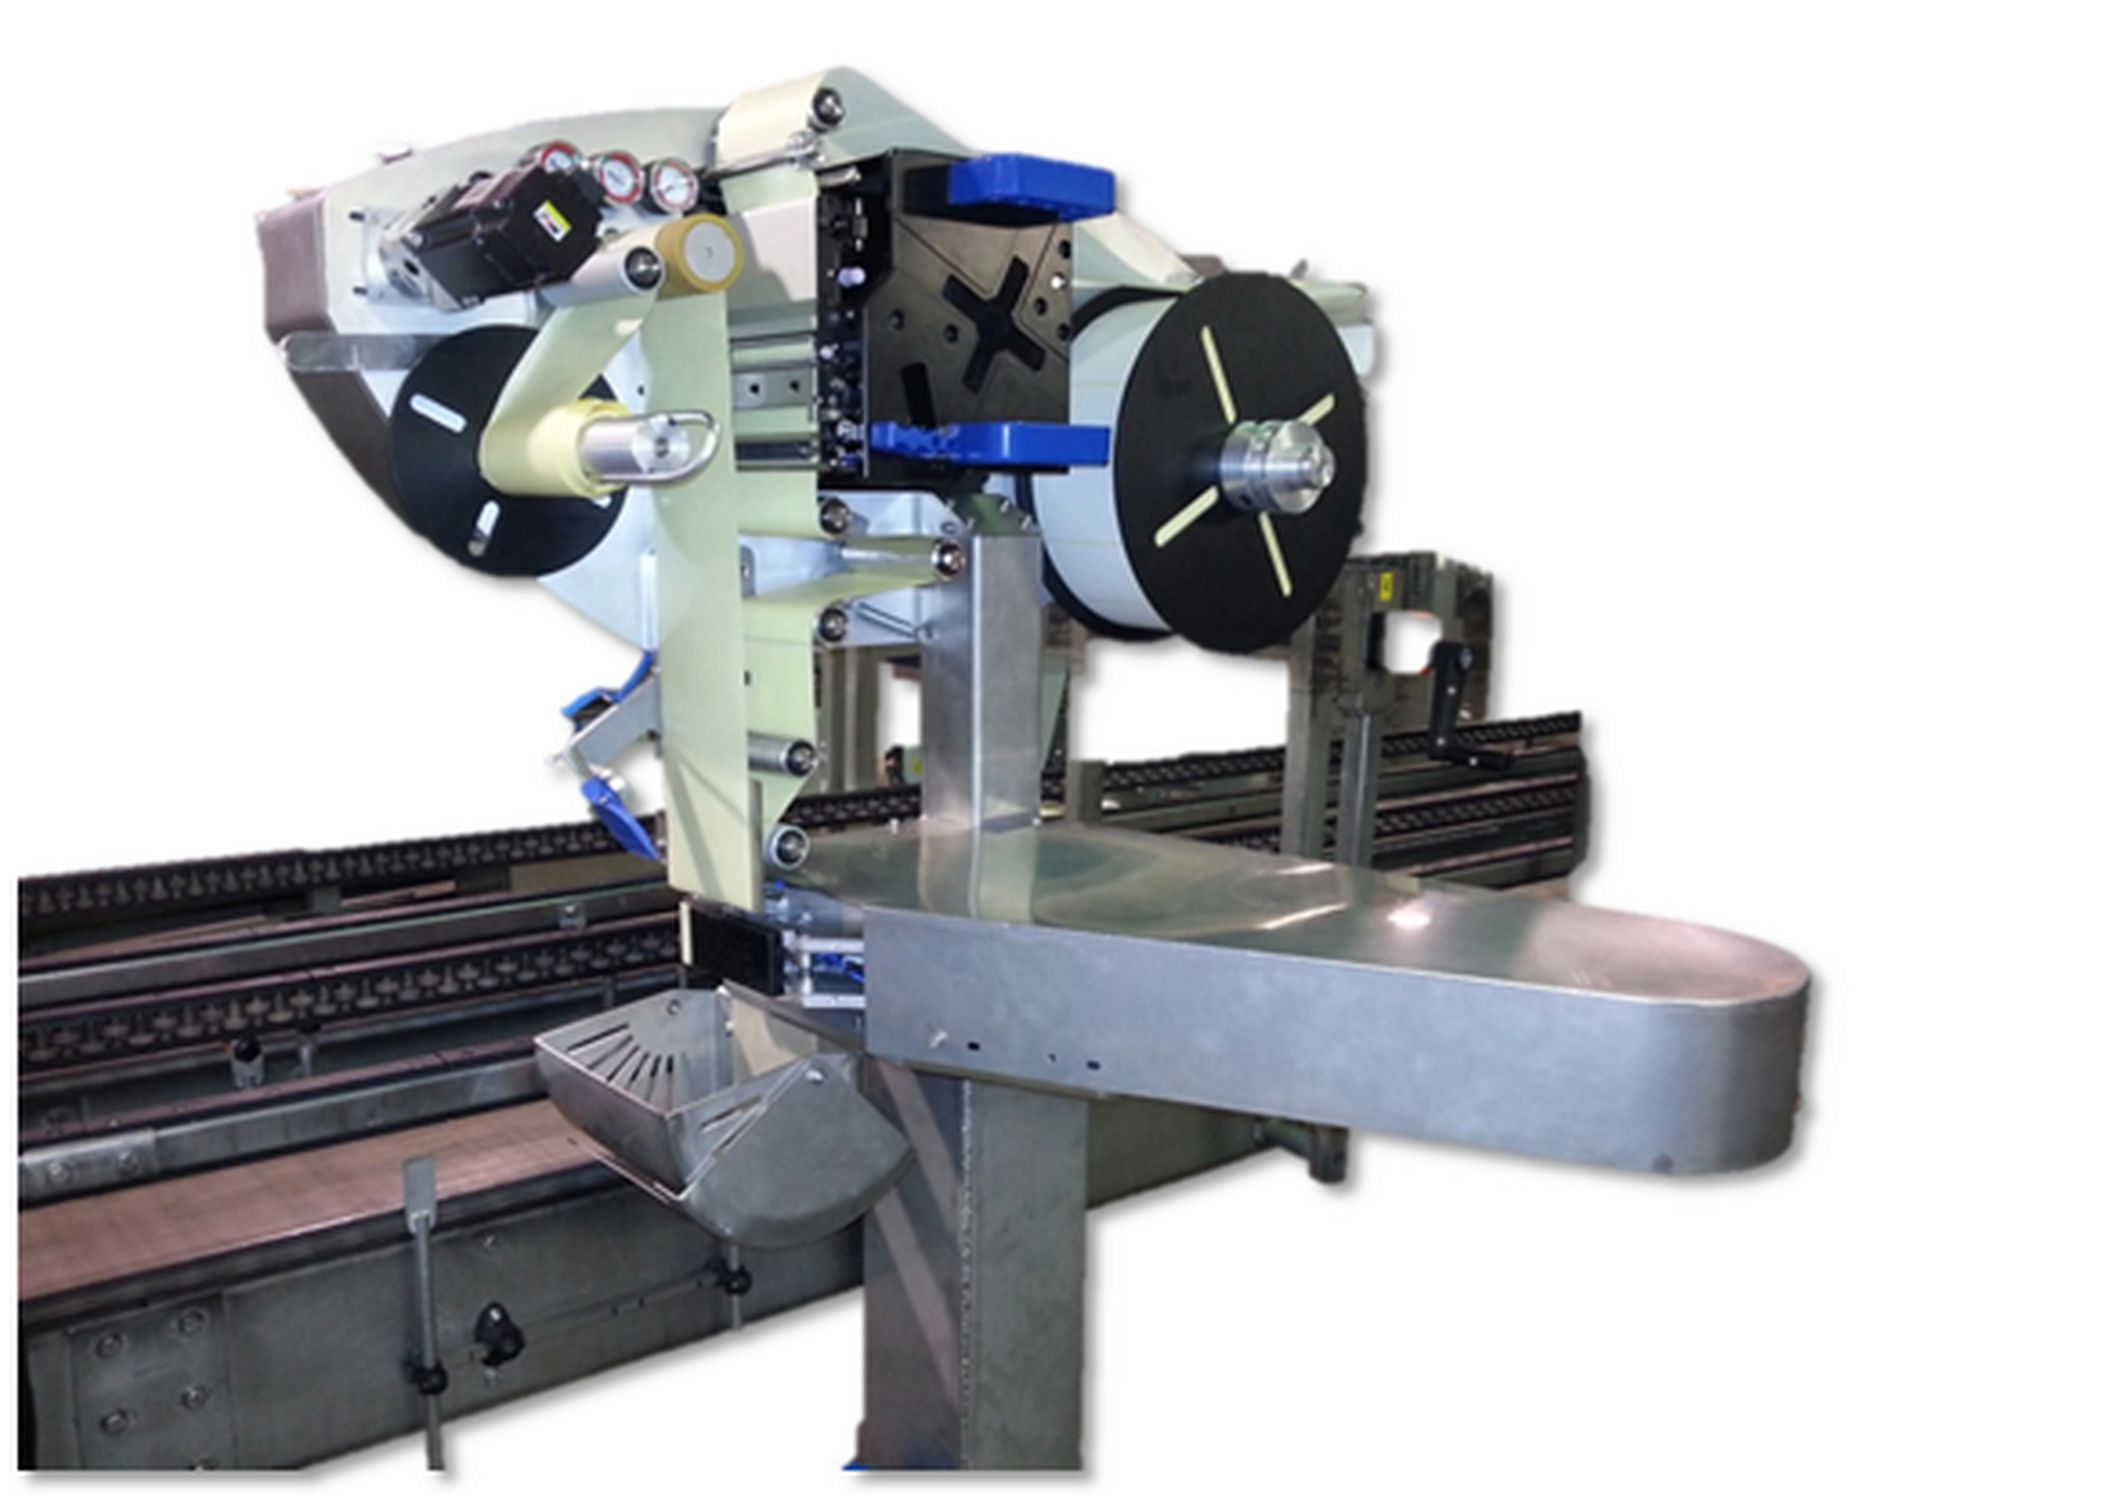 Color printer label - One Color Label Printer Applicator Carton For Labels High Speed Logitron 430